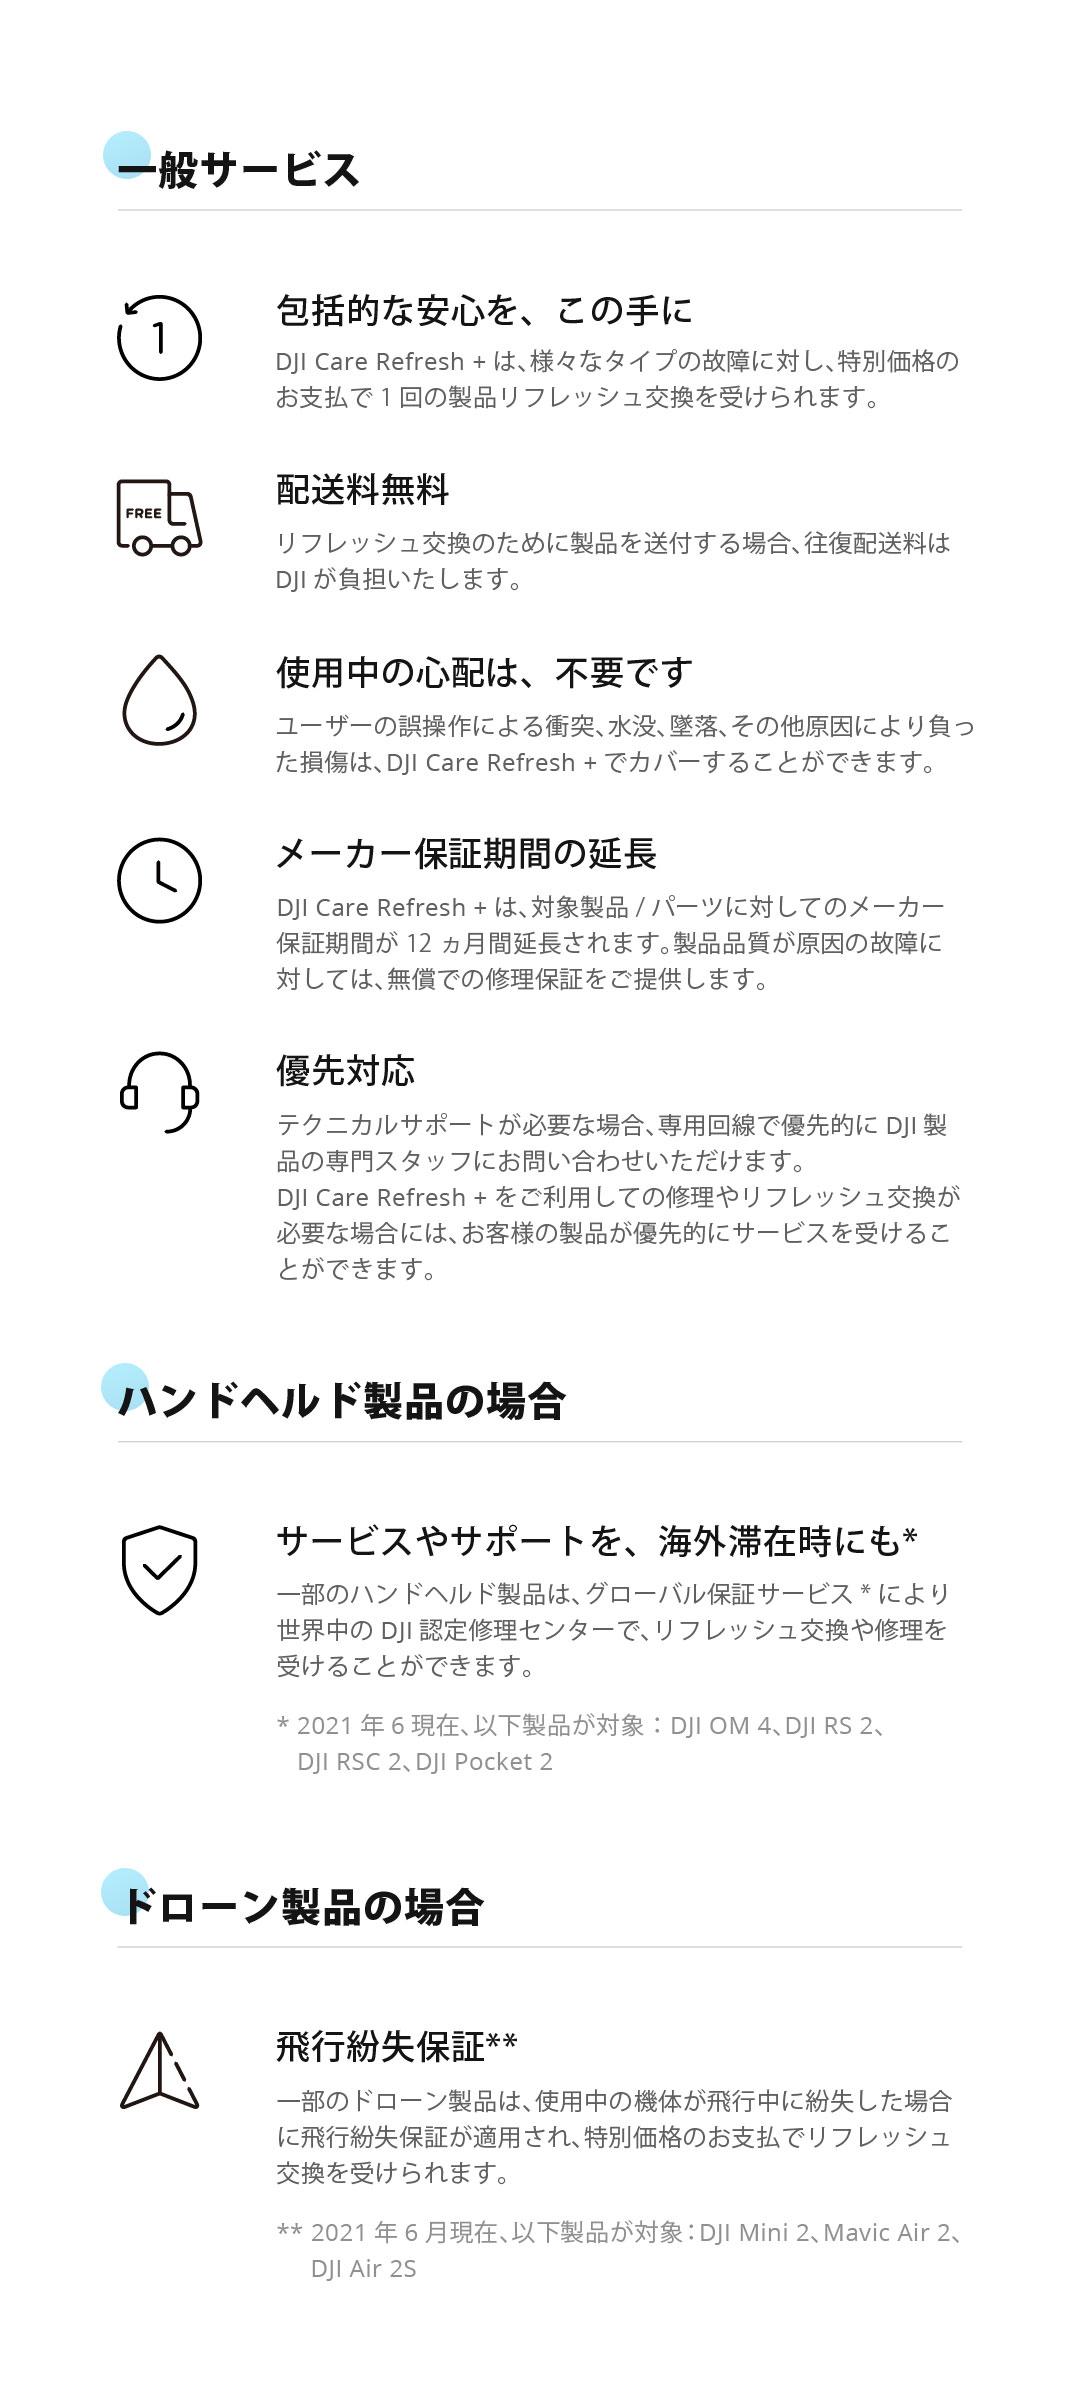 DJI Care Refresh Plus Feature JP